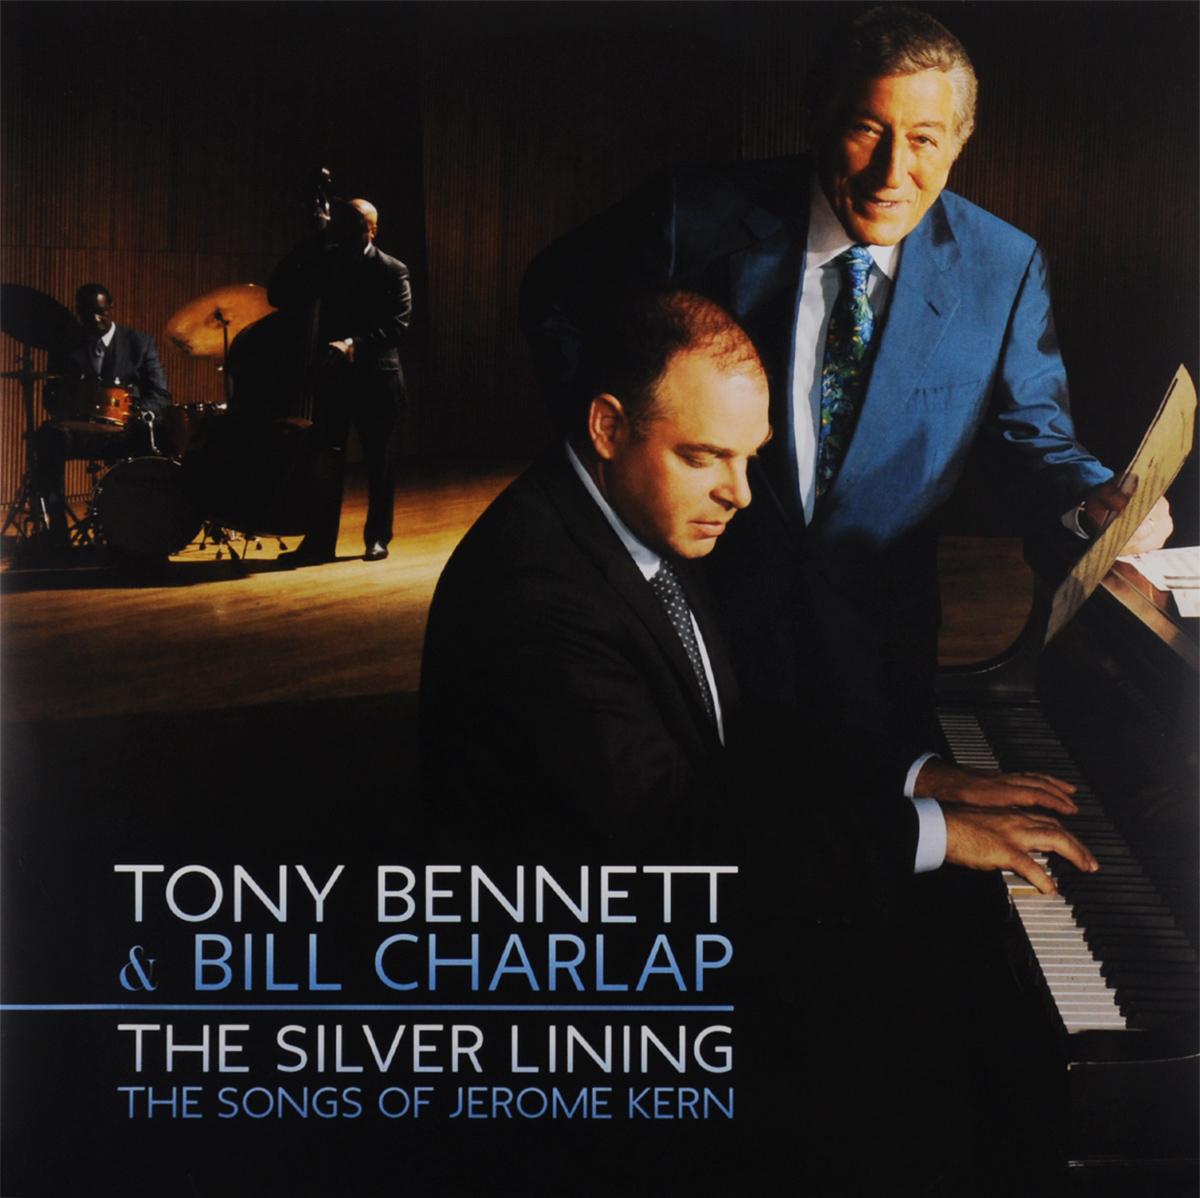 Тони Беннетт,Билл Харлап Tony Bennett & Bill Charlap. The Silver Lining. The Songs Of Jerome Kern (2 LP) дайана кролл тони беннетт bill charlap trio tony bennett